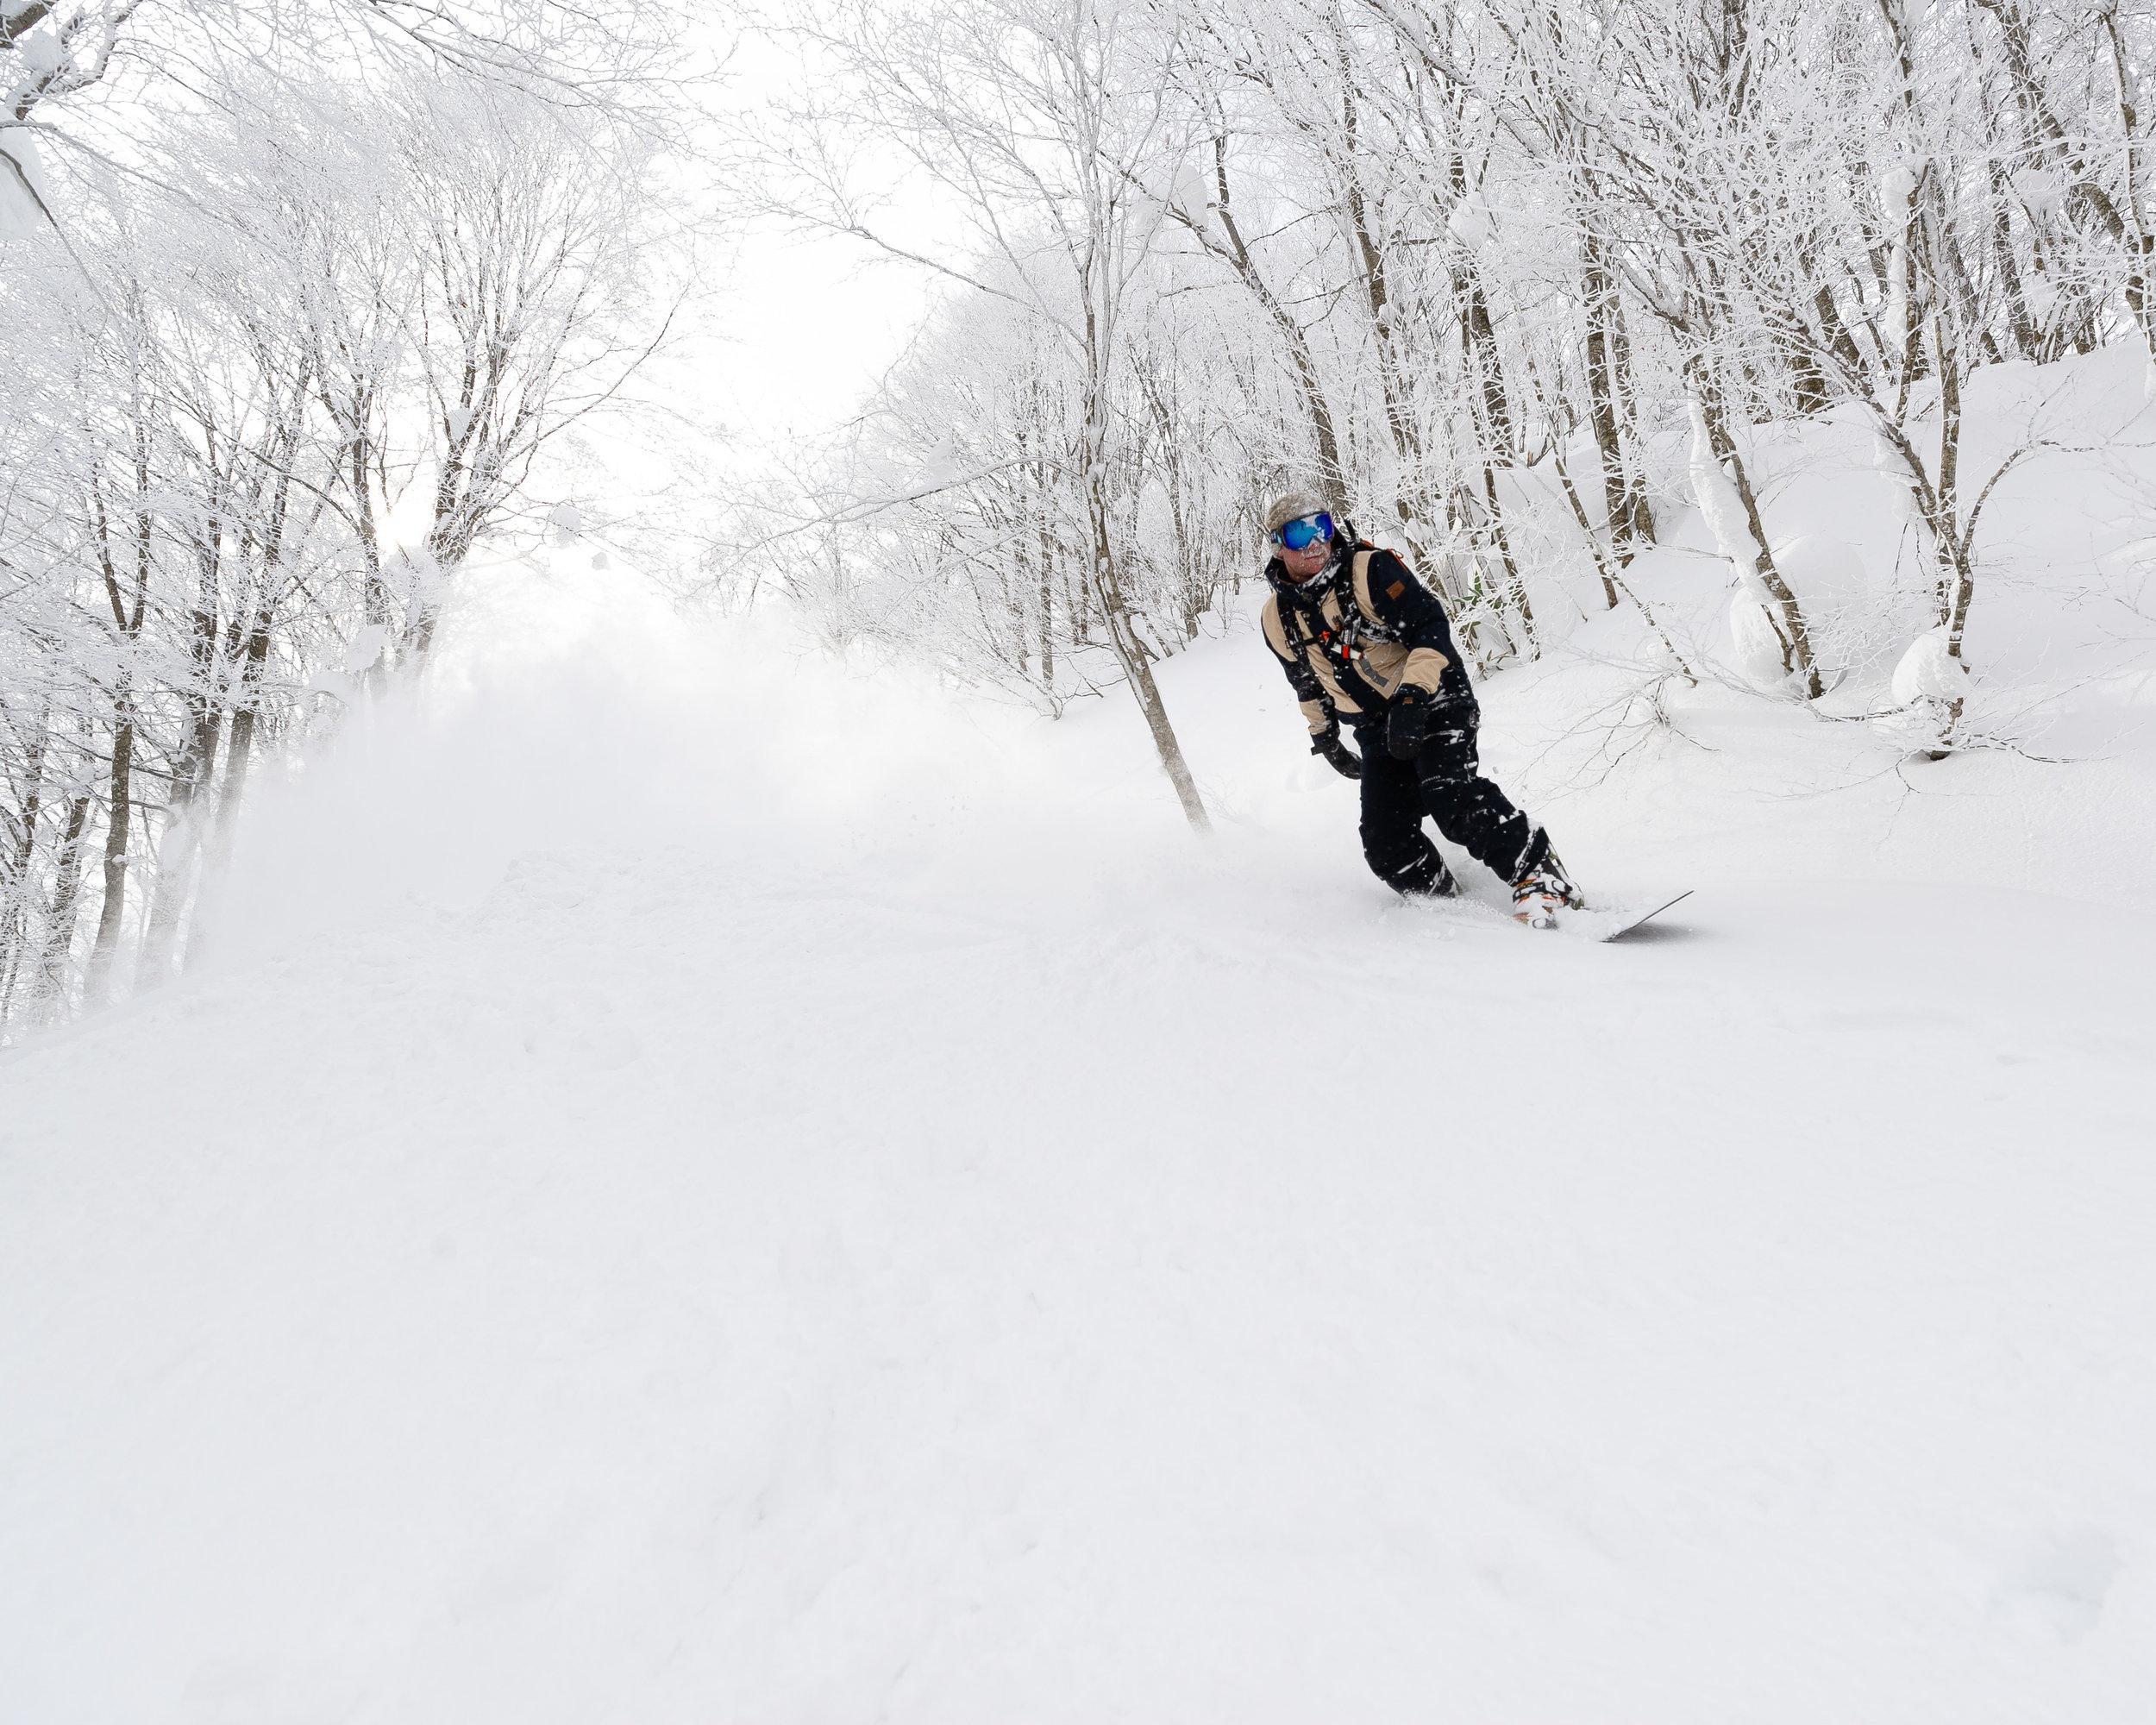 JGasaway_Skiing-22.jpg